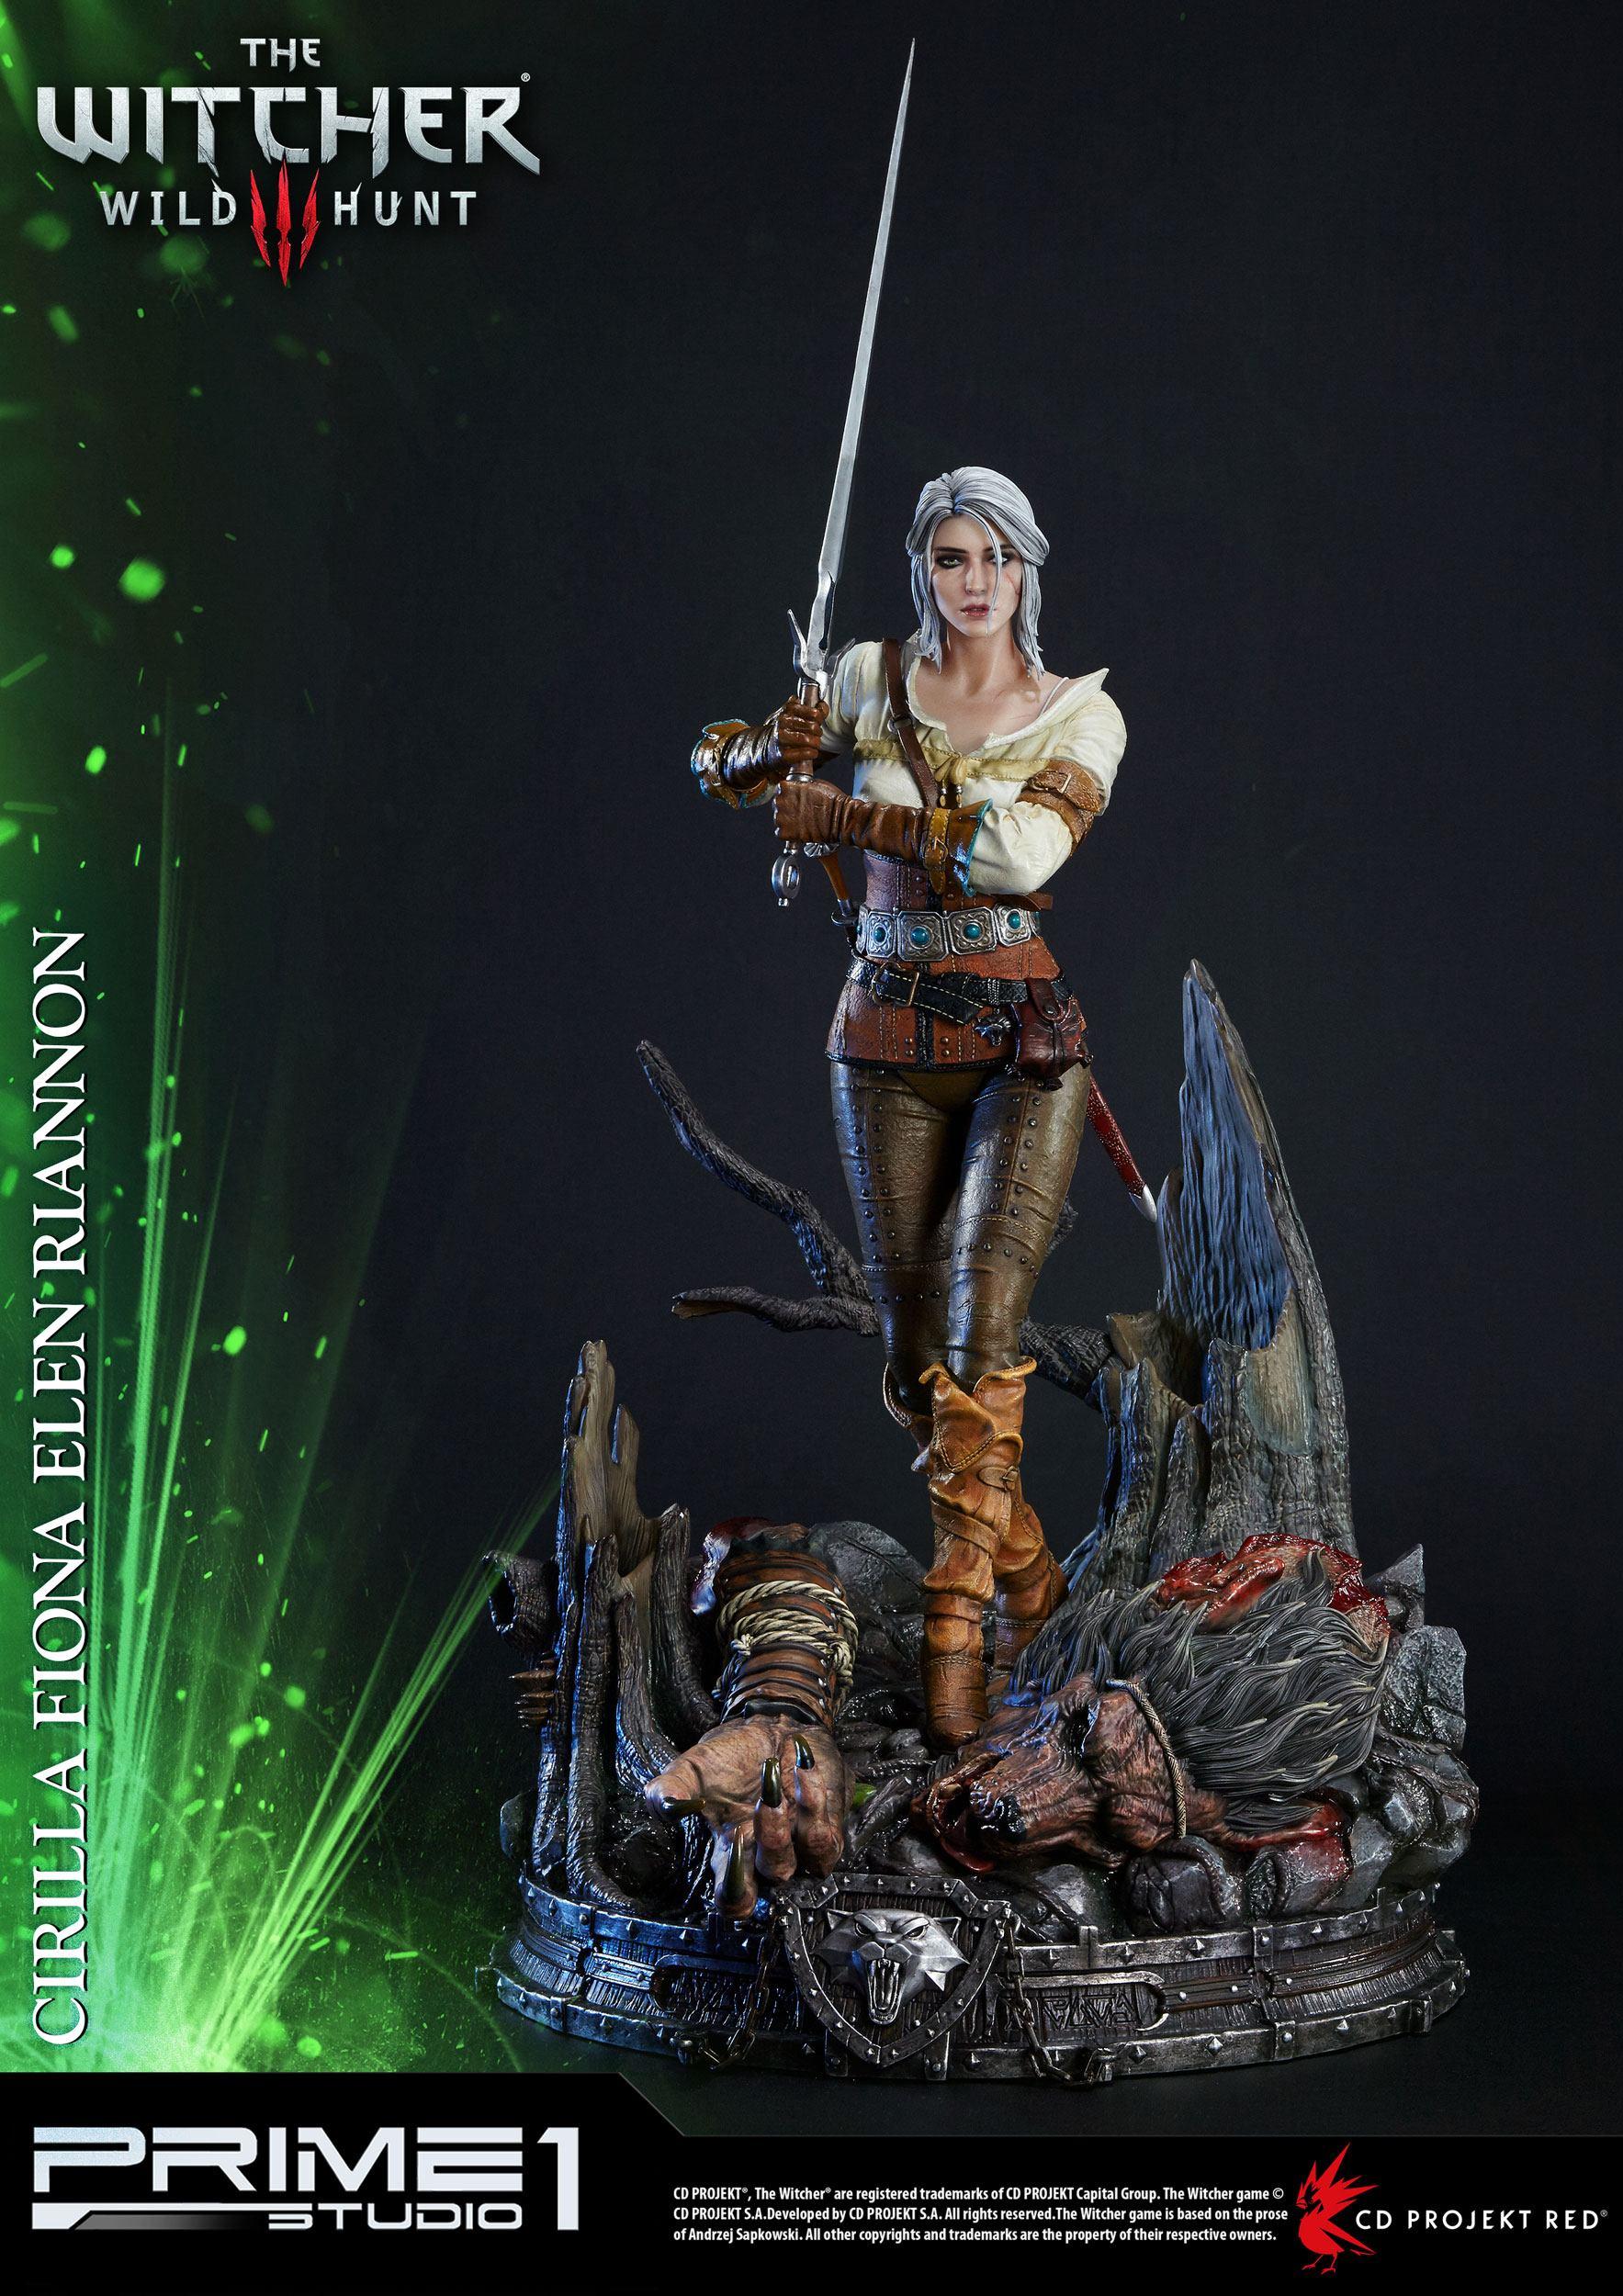 The Witcher Ciri